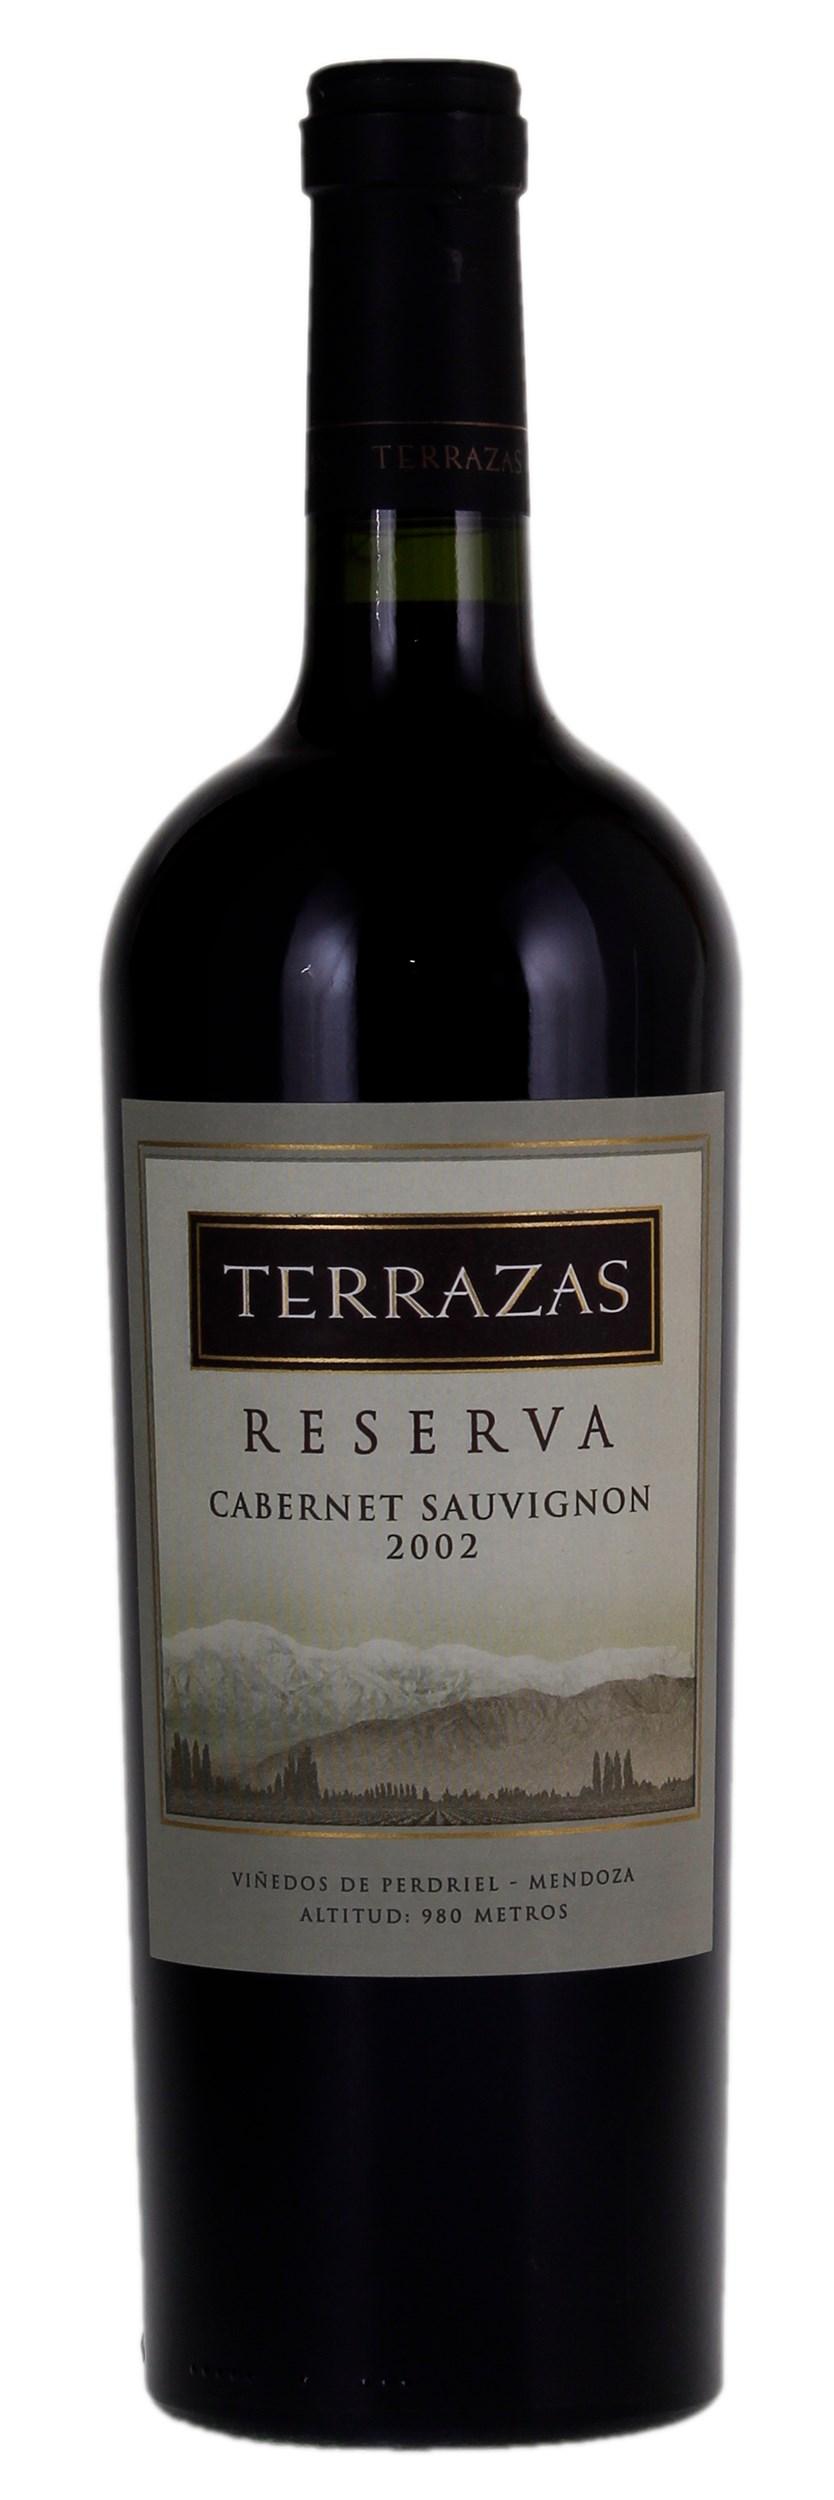 Terrazas De Los Andes Cabernet Sauvignon Reserva 2002 Red